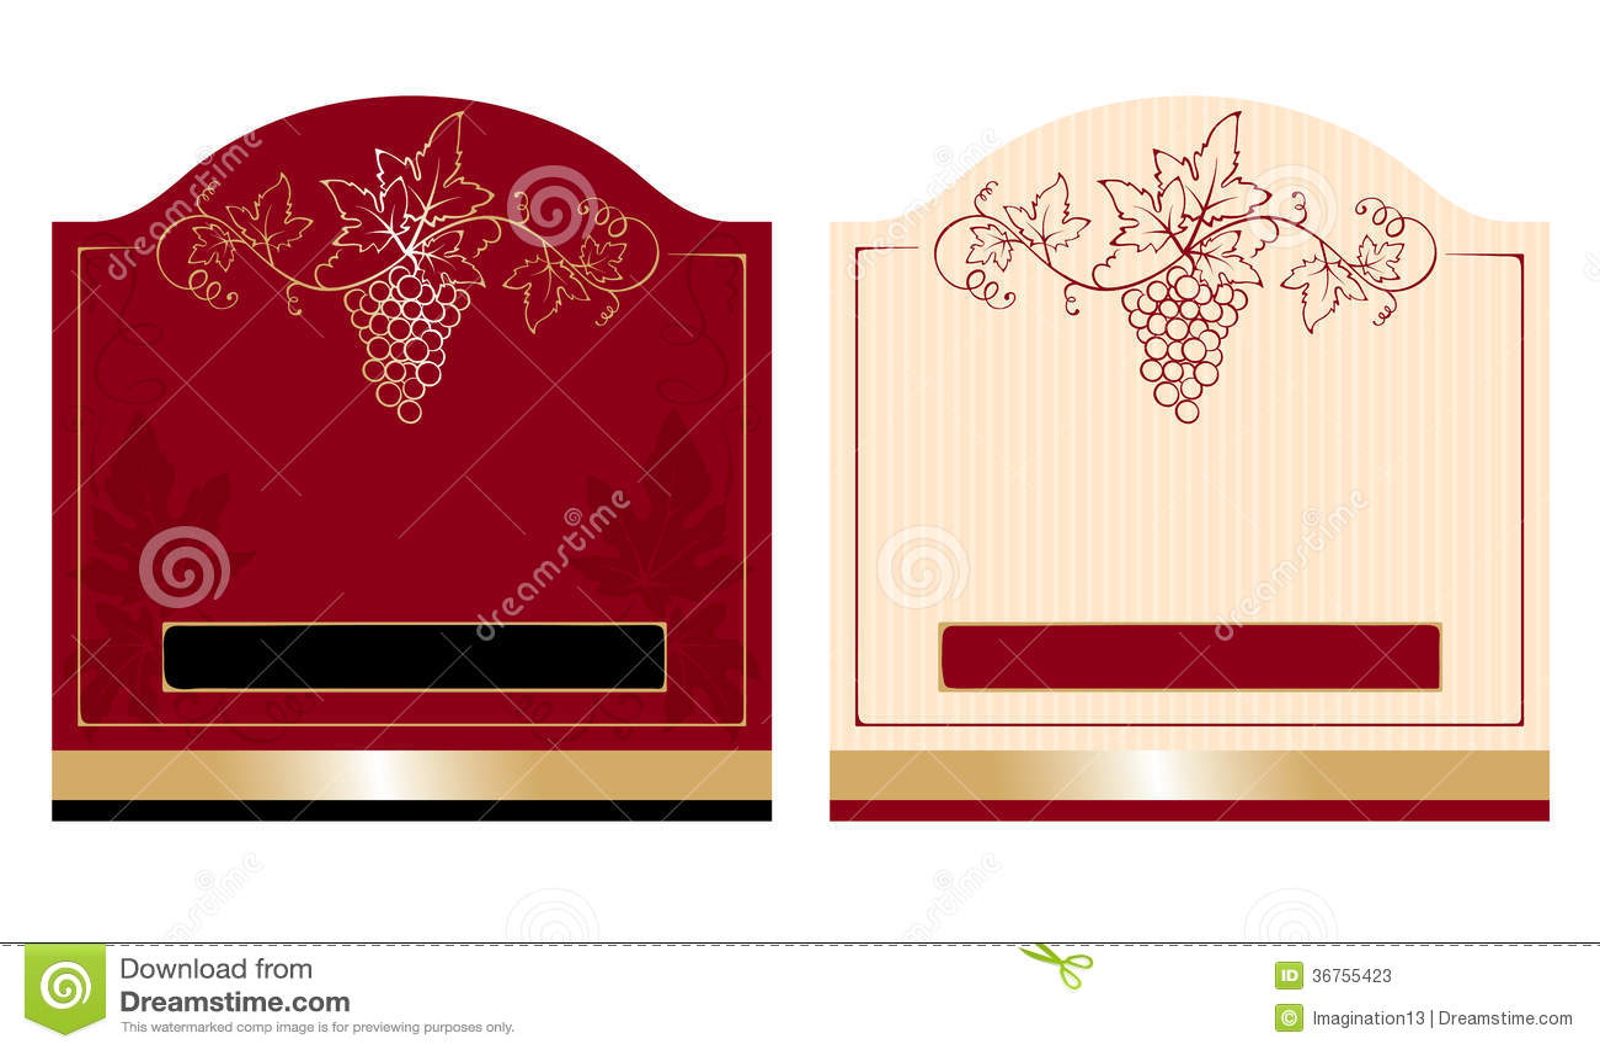 Printable Wedding Signs amp Templates by ViolaMirabilisDesign